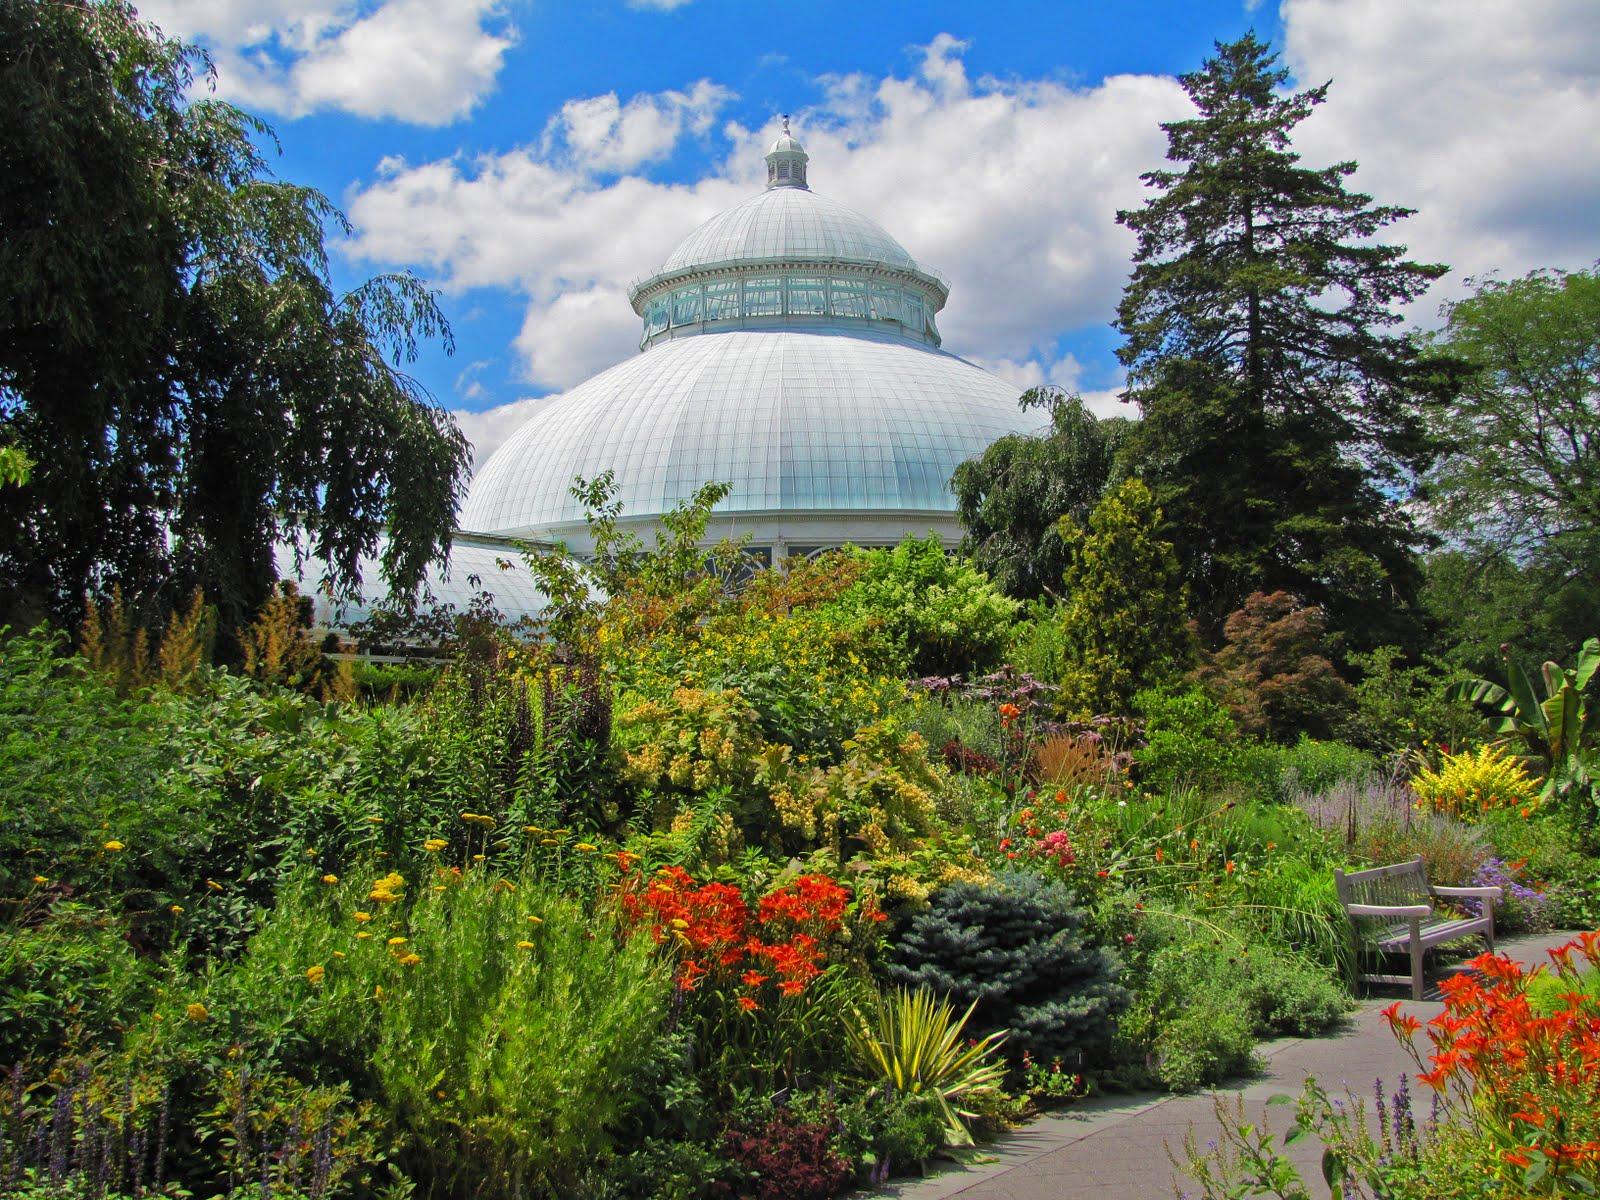 Pique nique new york nos endroits favoris new york off road for Bronx botanical garden free admission